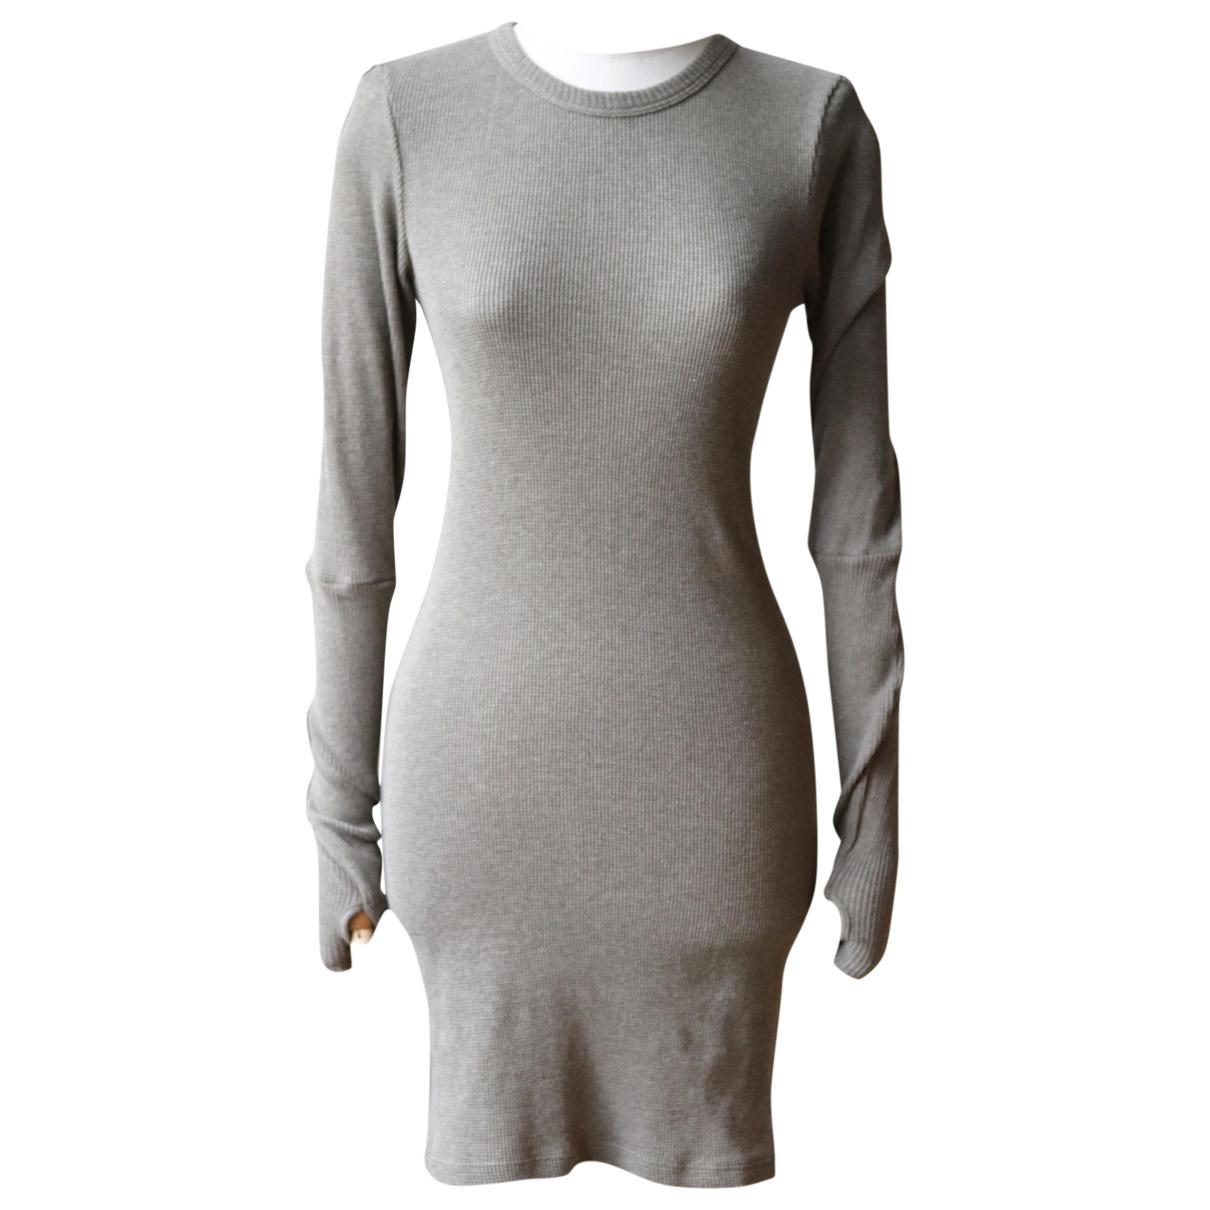 Enza Costa \N Kleid in  Gruen Baumwolle